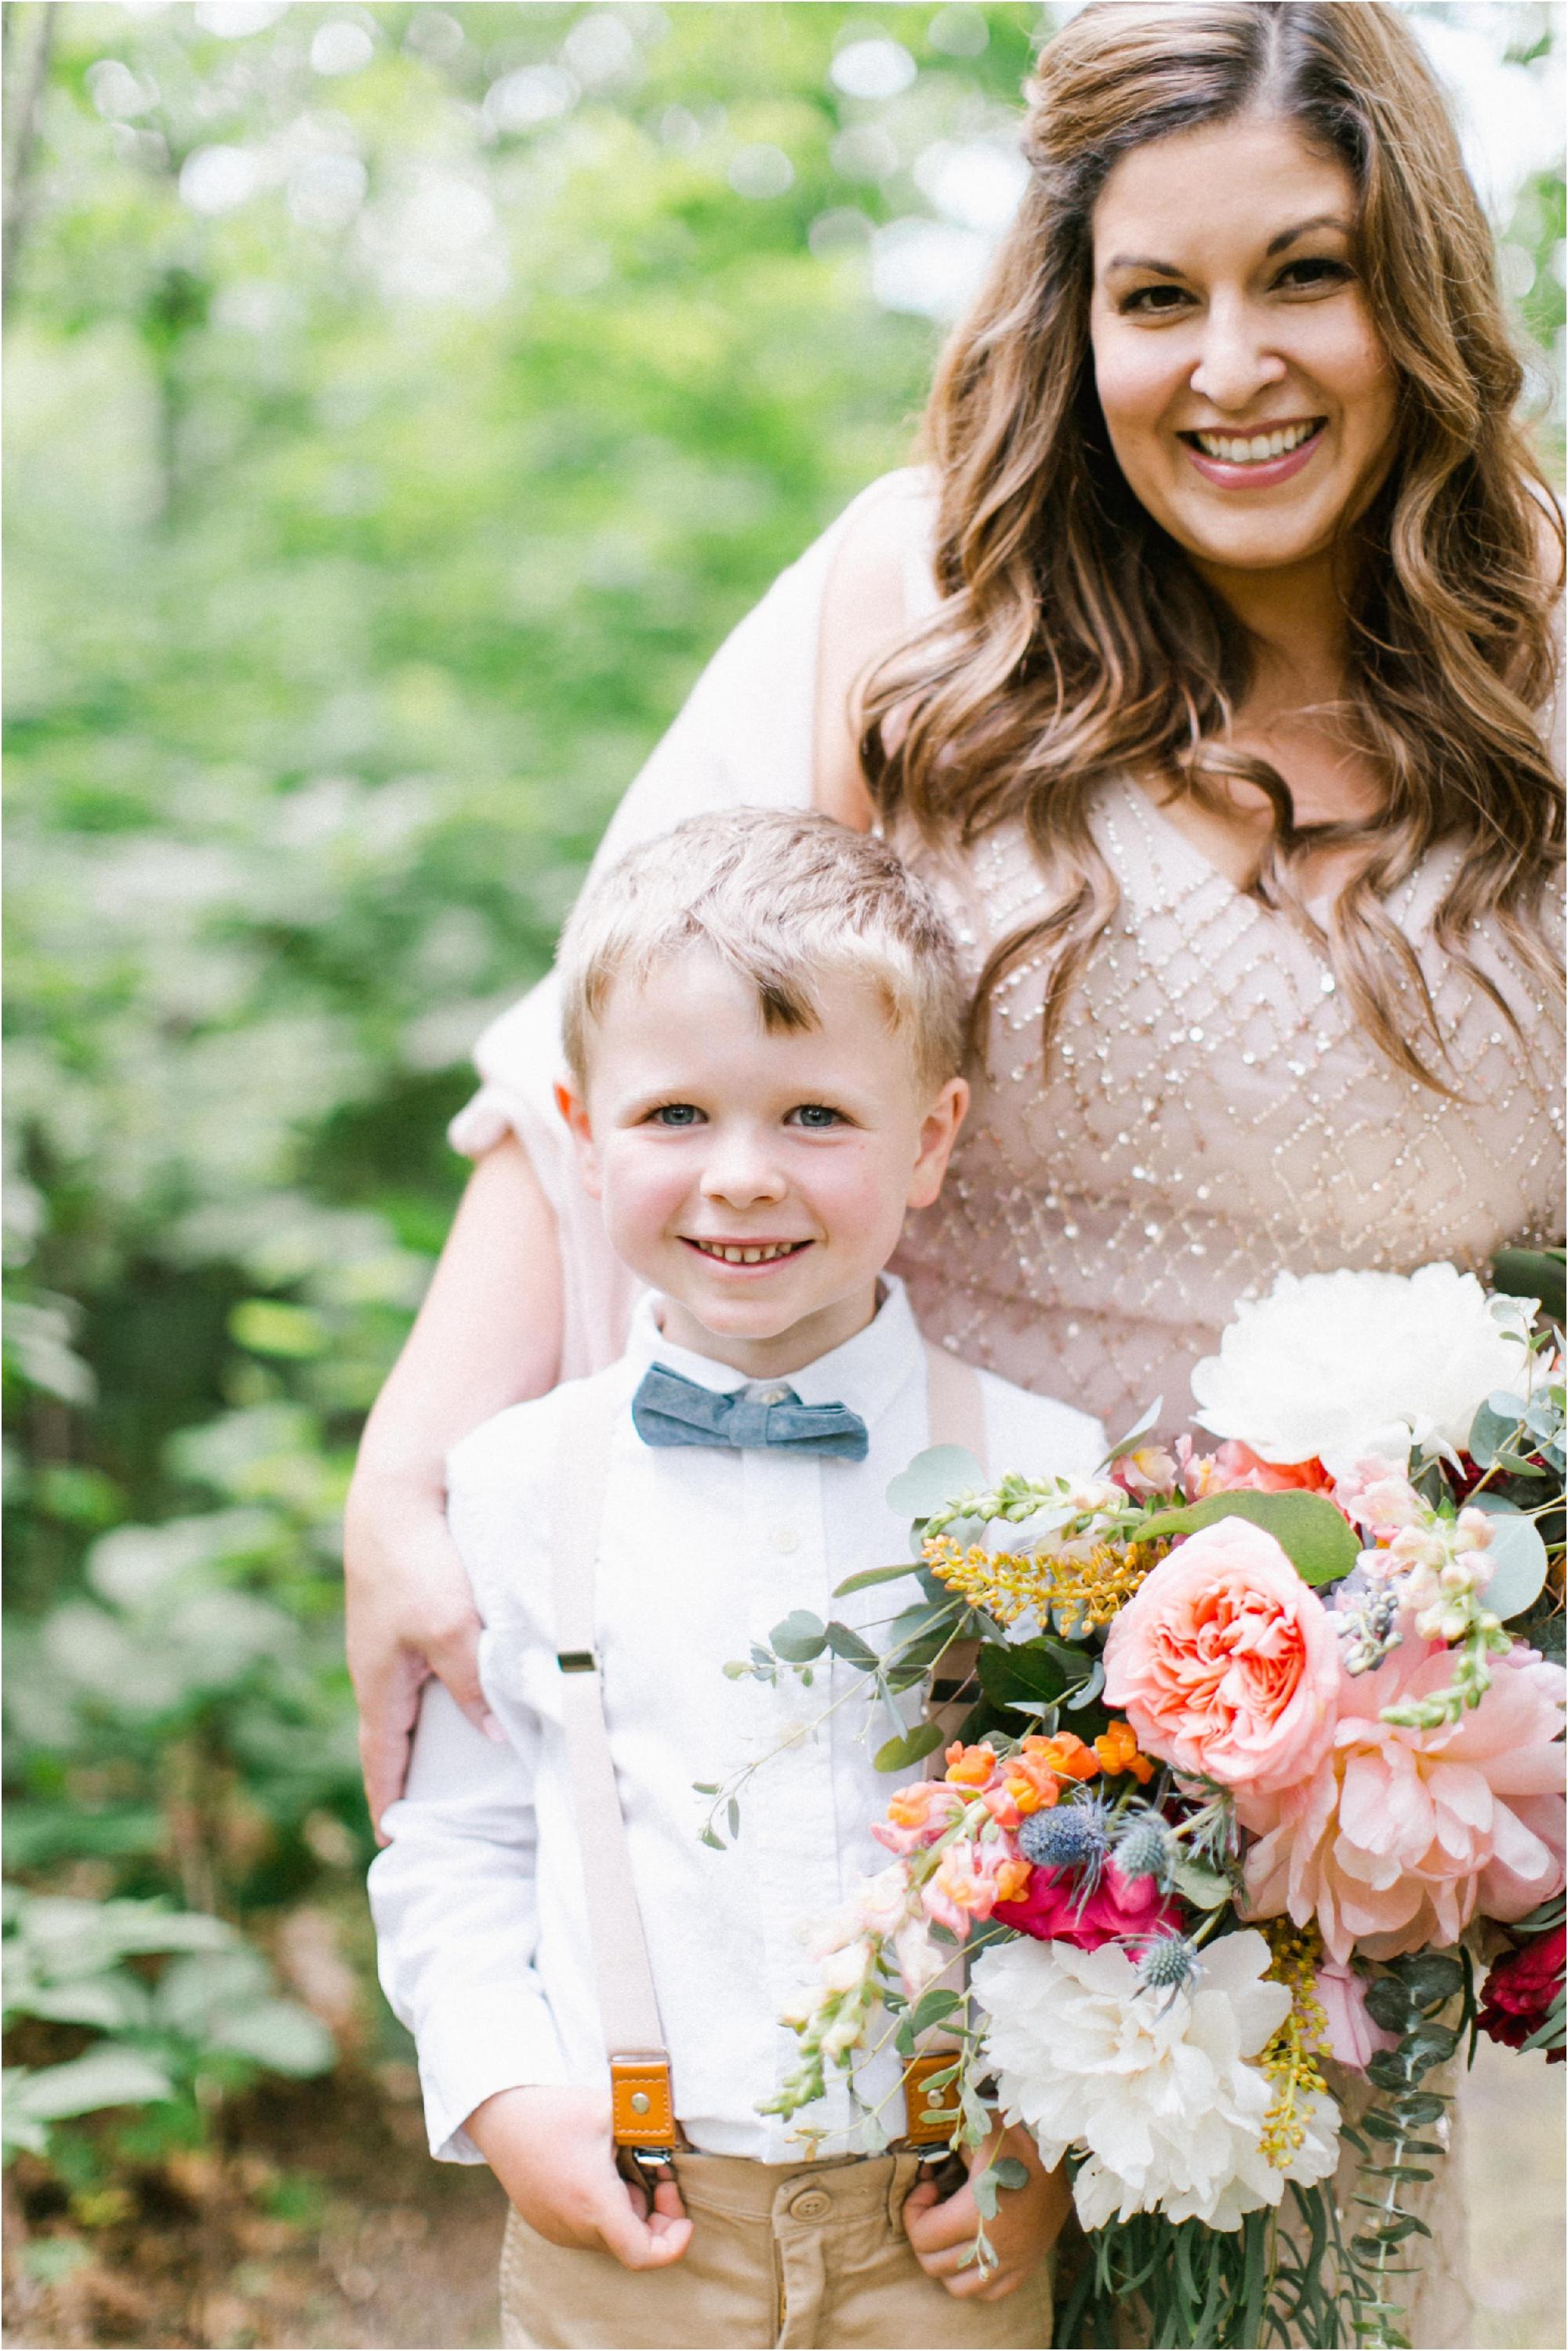 Wedding Photography Brainerd MN Aimee Jobe Photography Private Lake Residence Bloom Designs_0014.jpg